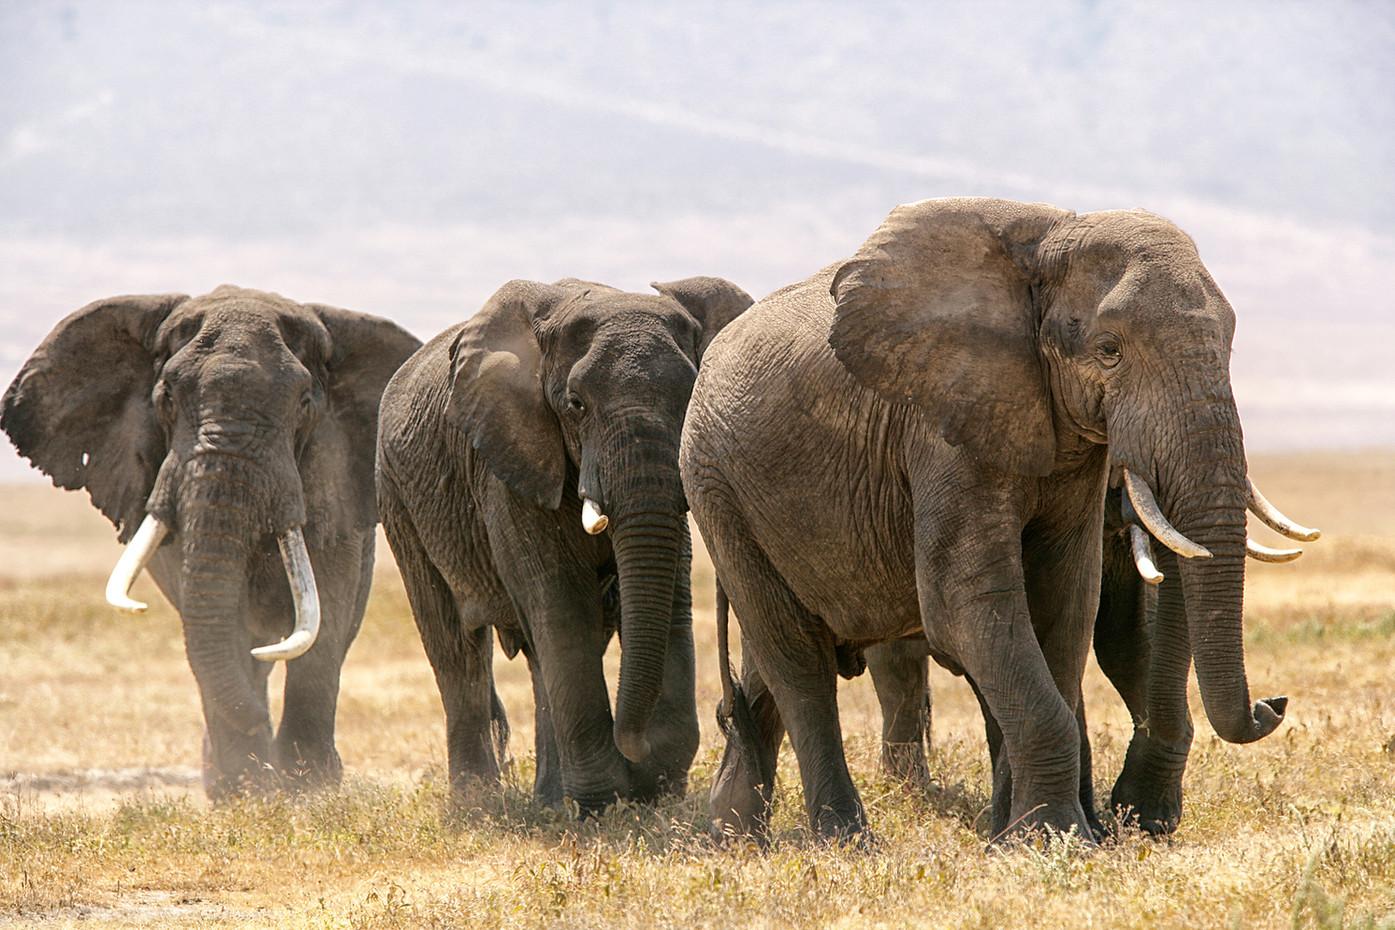 Bull Elephants in Ngorongoro Crater, Tanzania